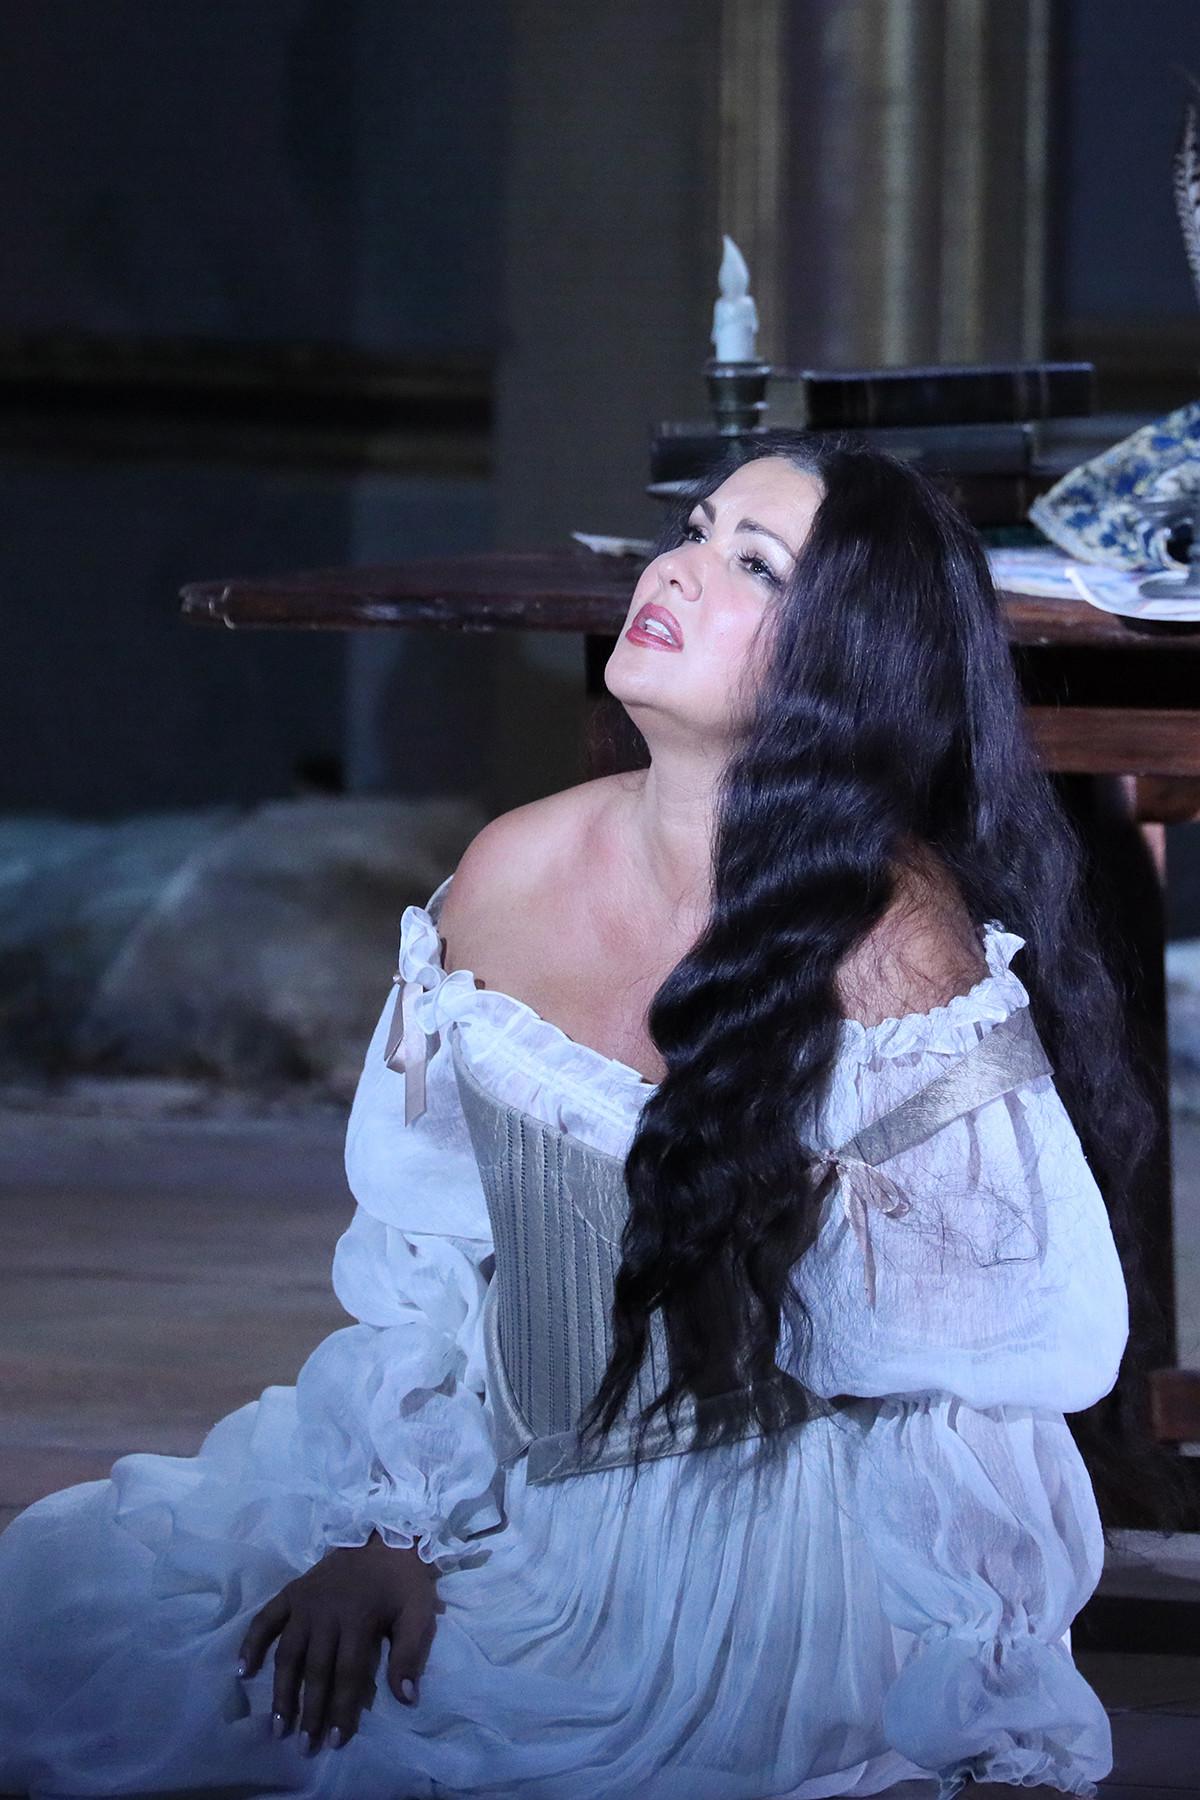 Anna Netrebko na ópera 'Don Carlo'. Damir Yusupov/bolshoi.ru